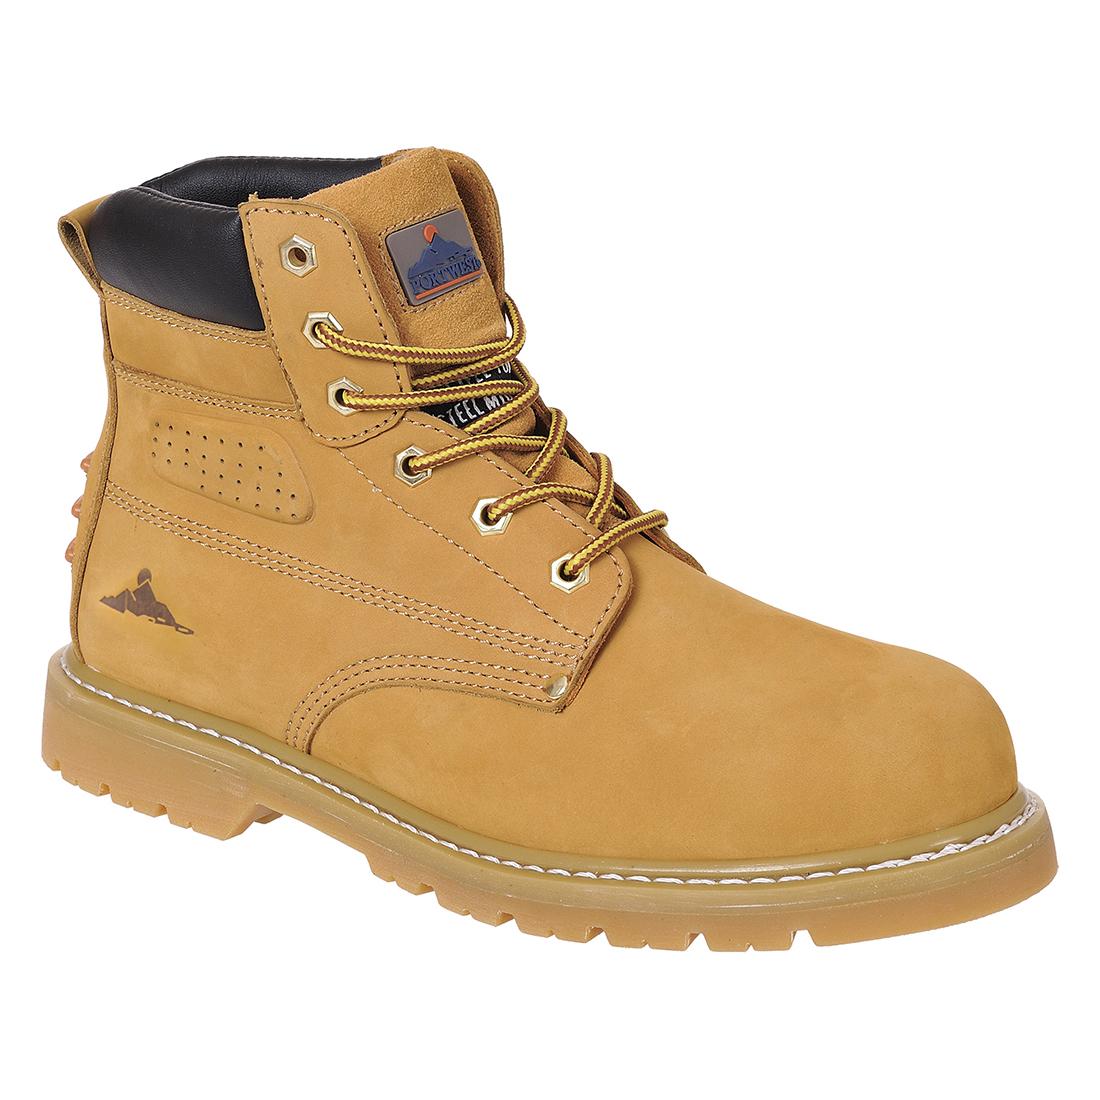 Steelite Welted Plus Safety Boot SBP HRO Honey 43         9